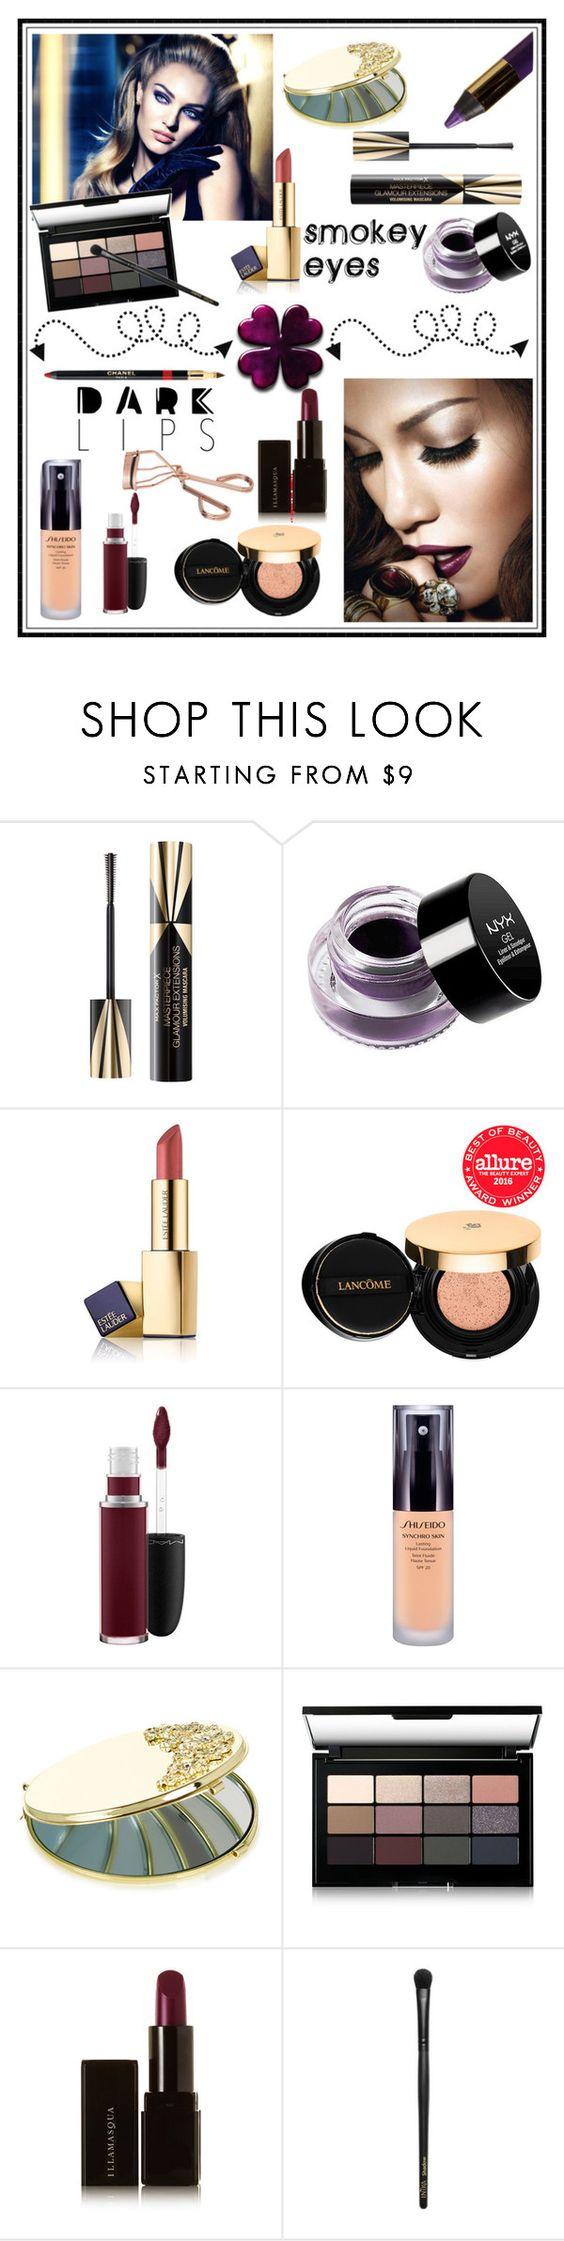 """SMOKEY EYES, DARK LIPS!!!"" by kskafida ❤ liked on Polyvore featuring beauty, Max Factor, NYX, Estée Lauder, L'Oréal Paris, Lancôme, MAC Cosmetics, Shiseido, Monsoon and Bobbi Brown Cosmetics"